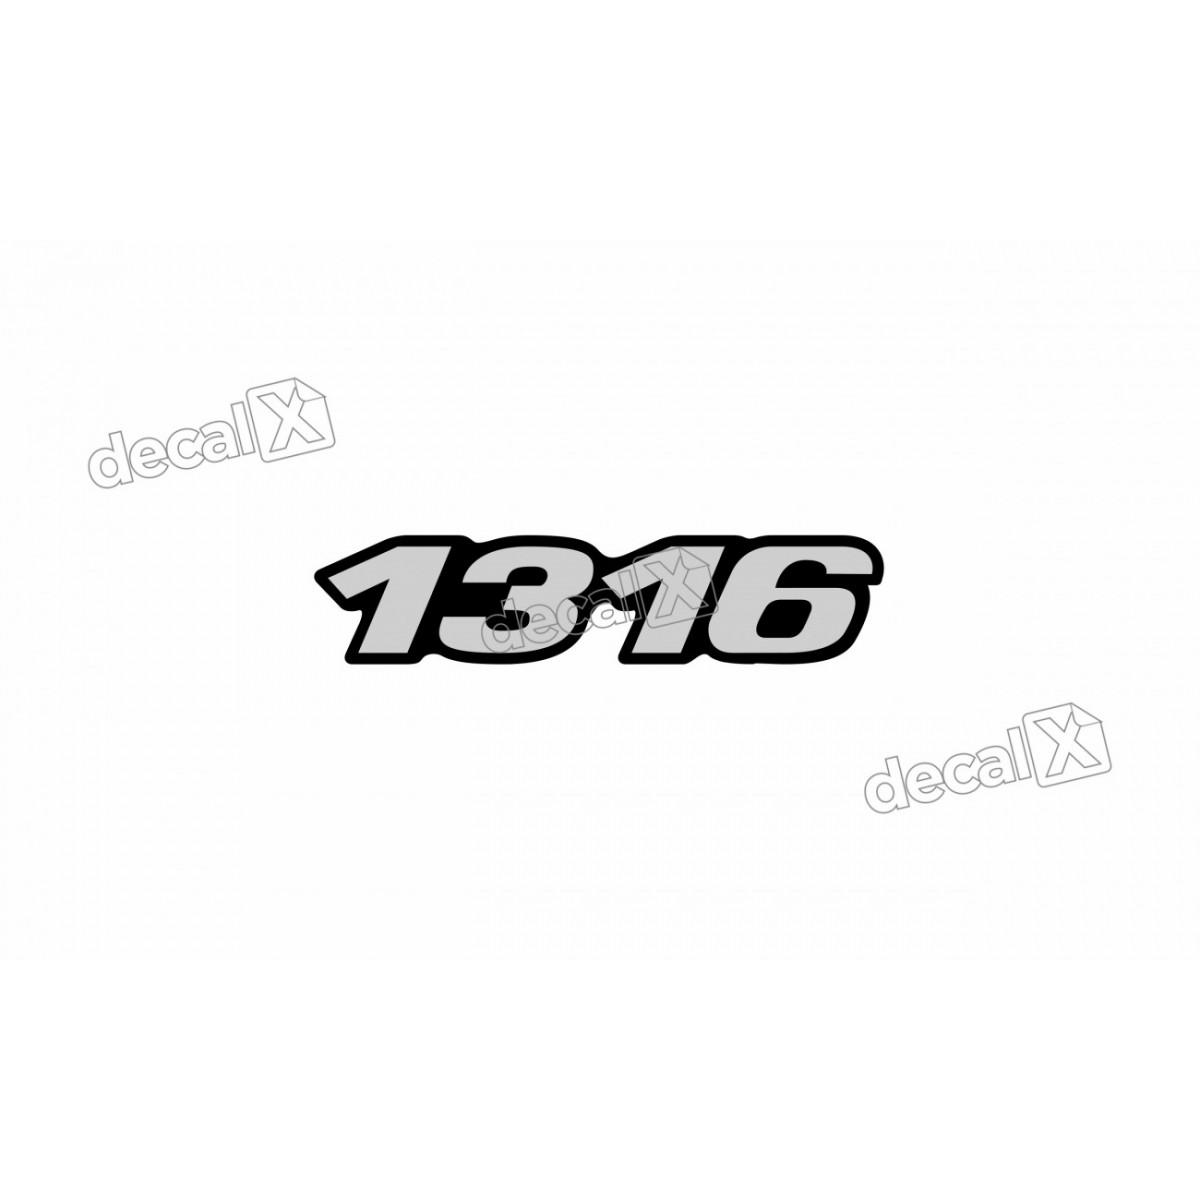 Adesivo Emblema Resinado Mercedes 1316 Cm25 Decalx